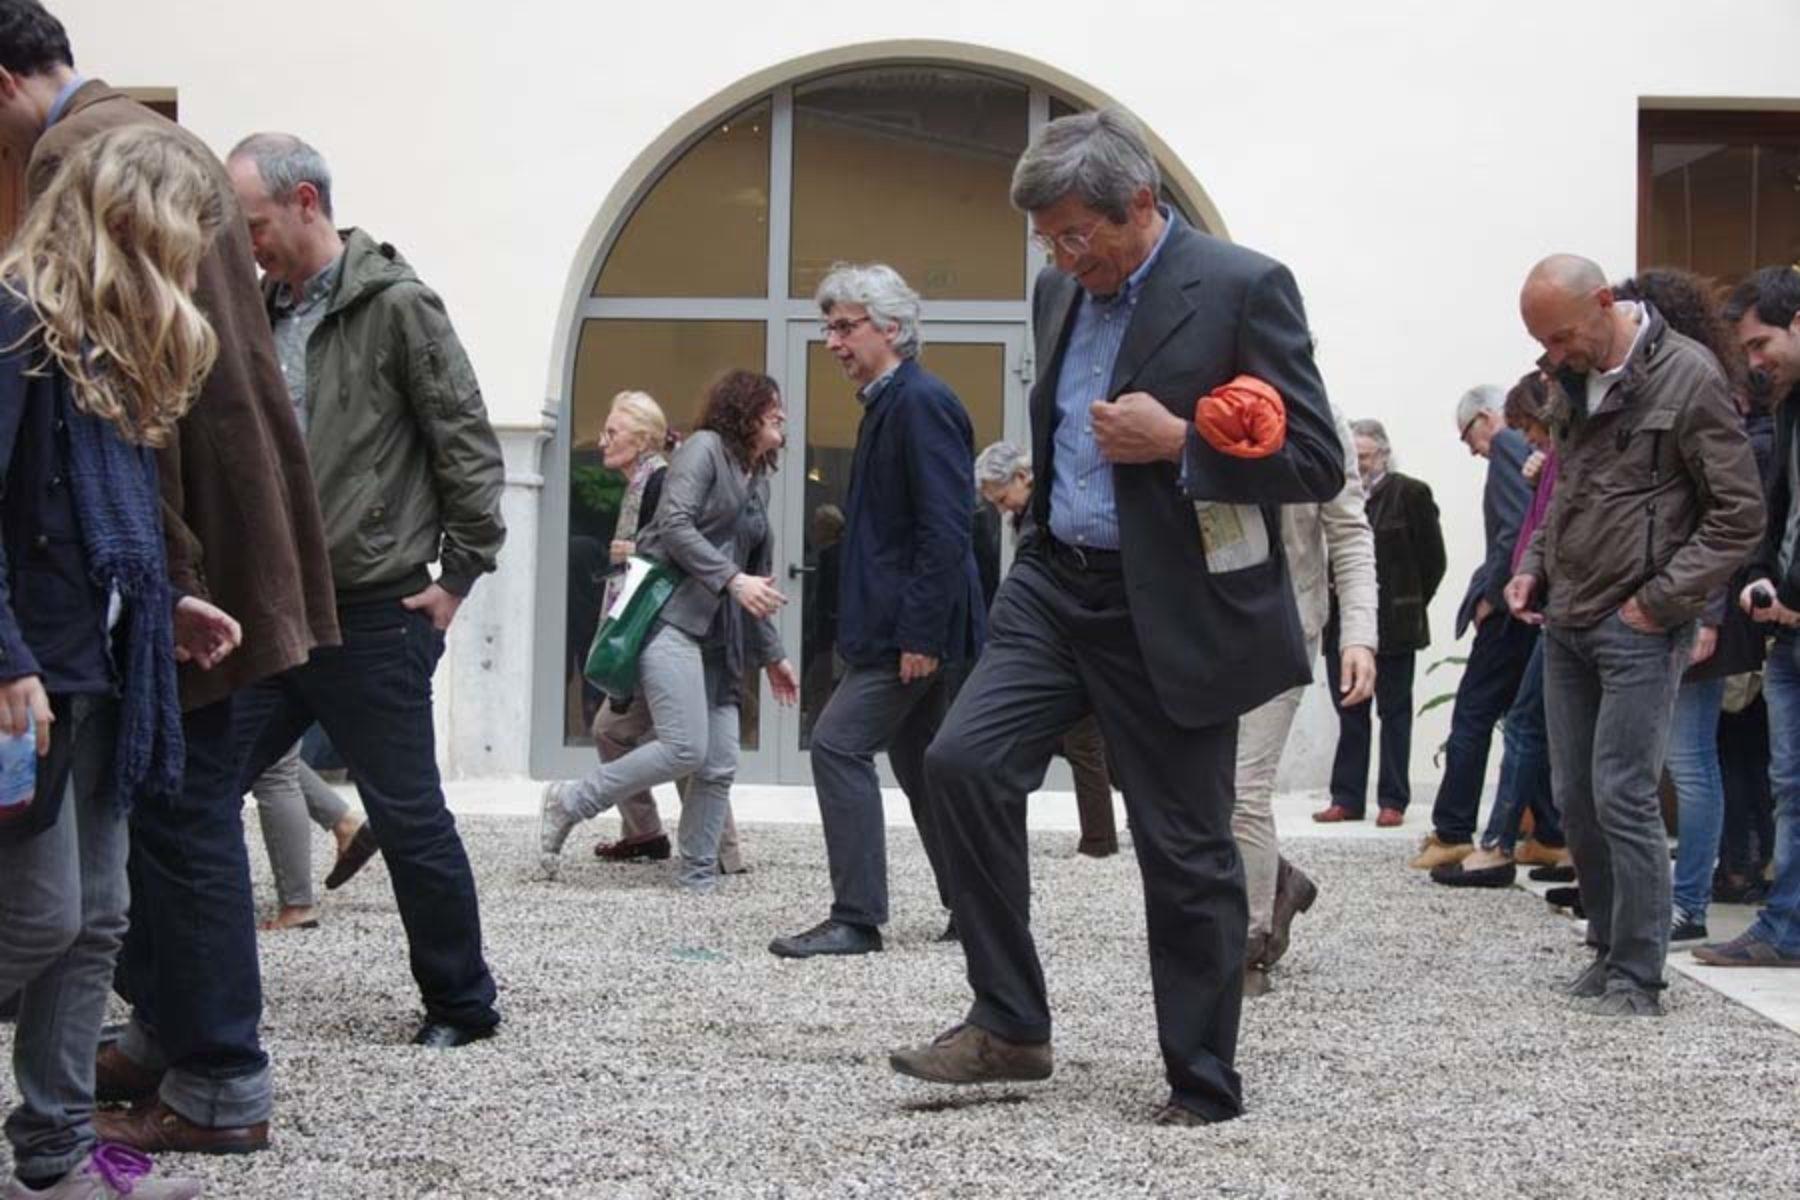 Ivan Moudov, Stones, 2013, stones, foam rubber, site specific installation